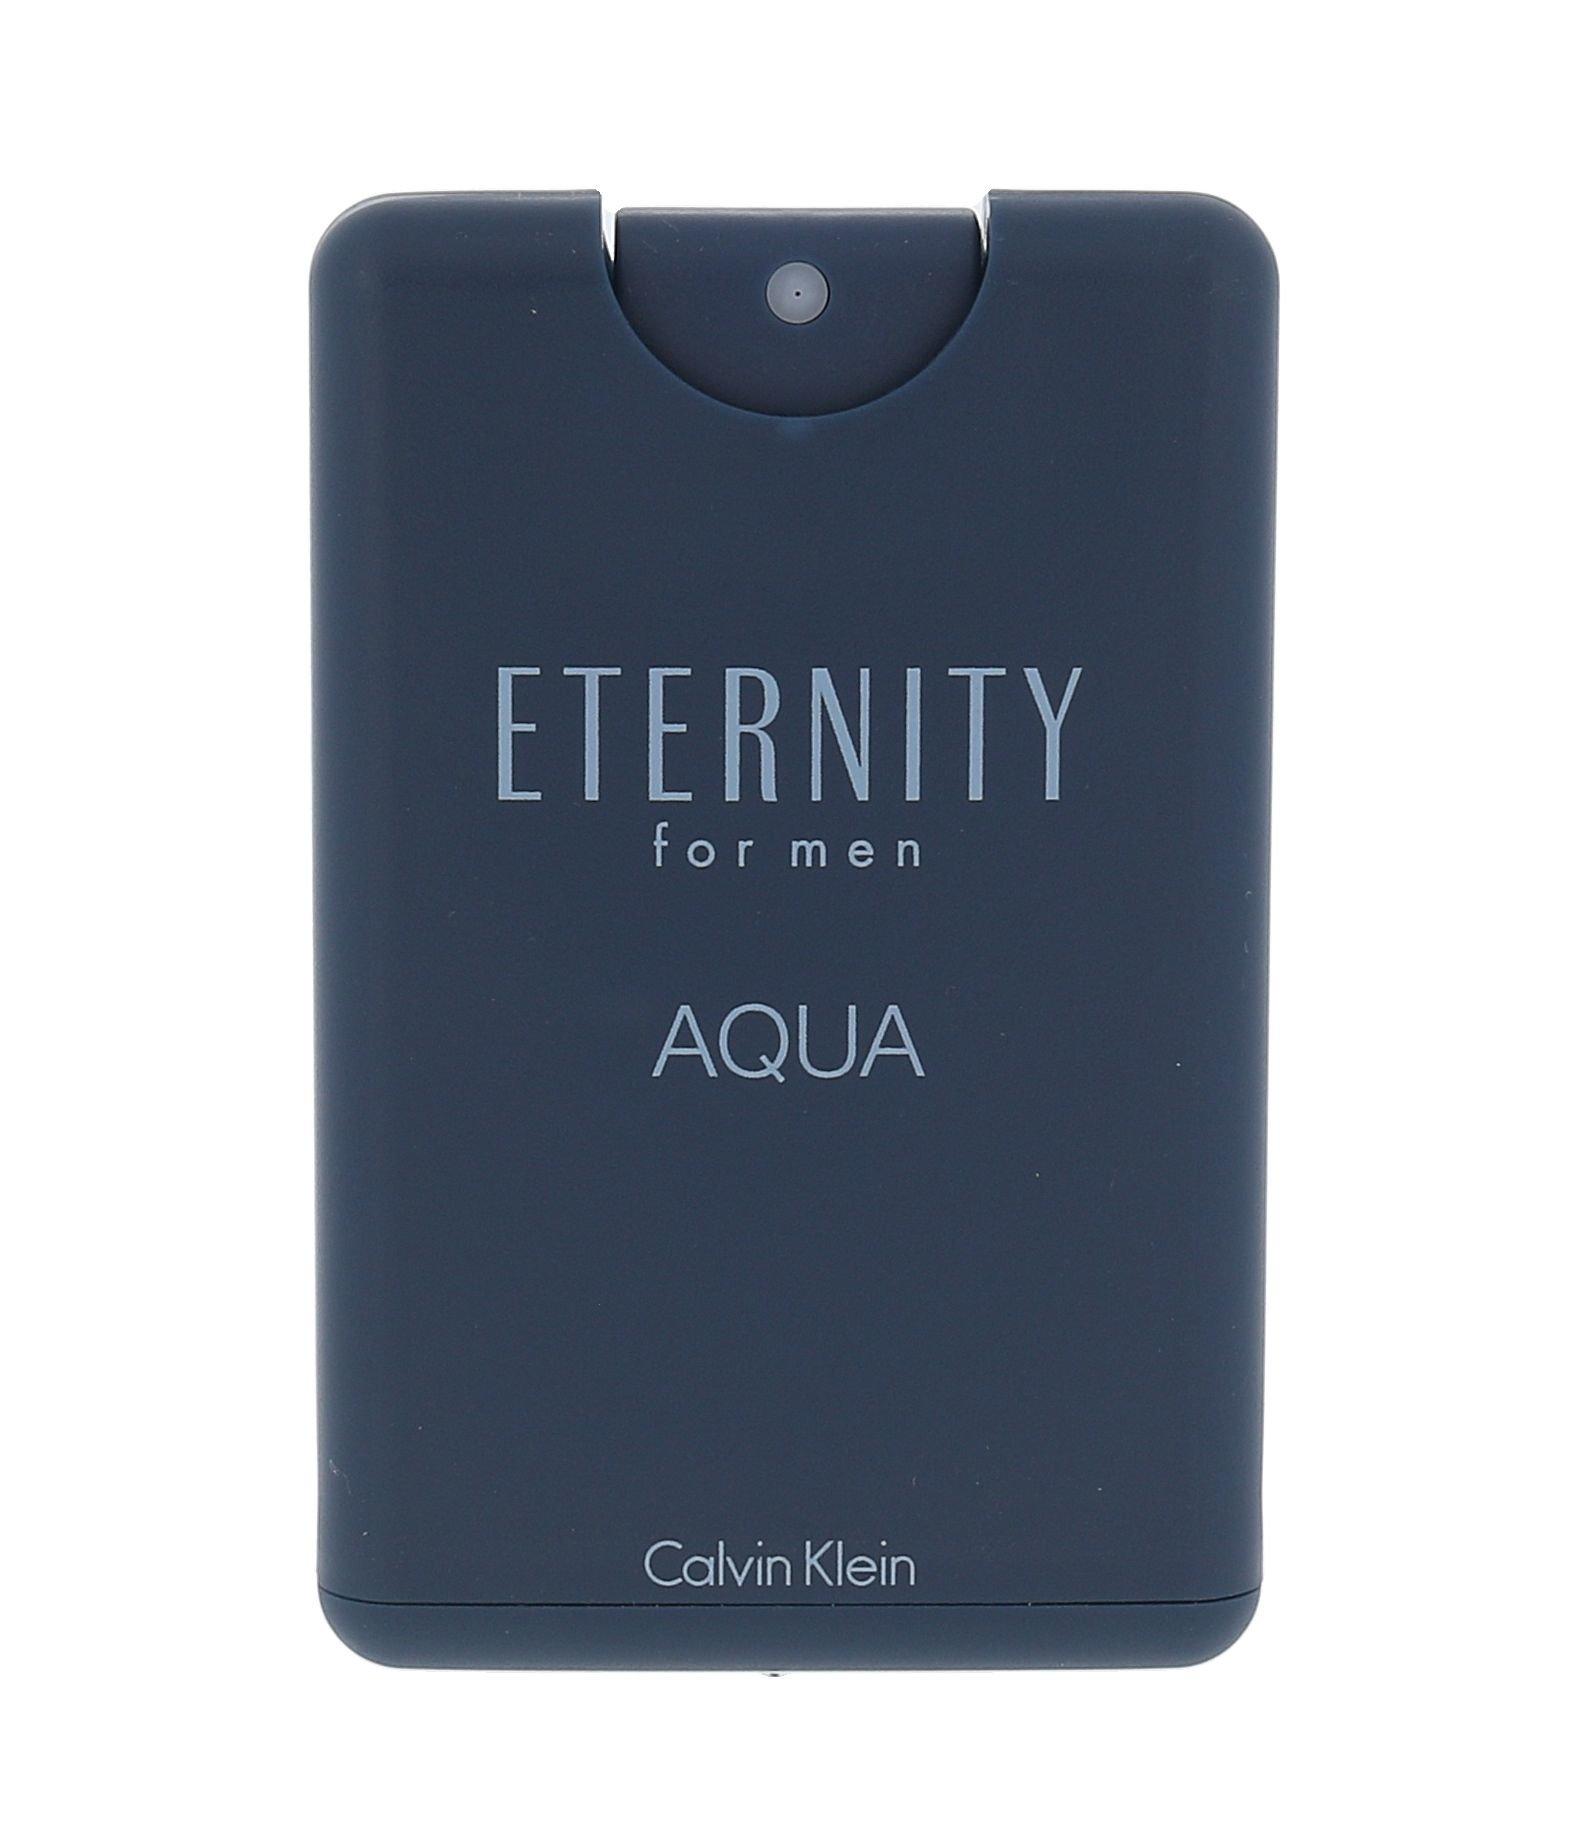 Calvin Klein Eternity Eau de Toilette 20ml